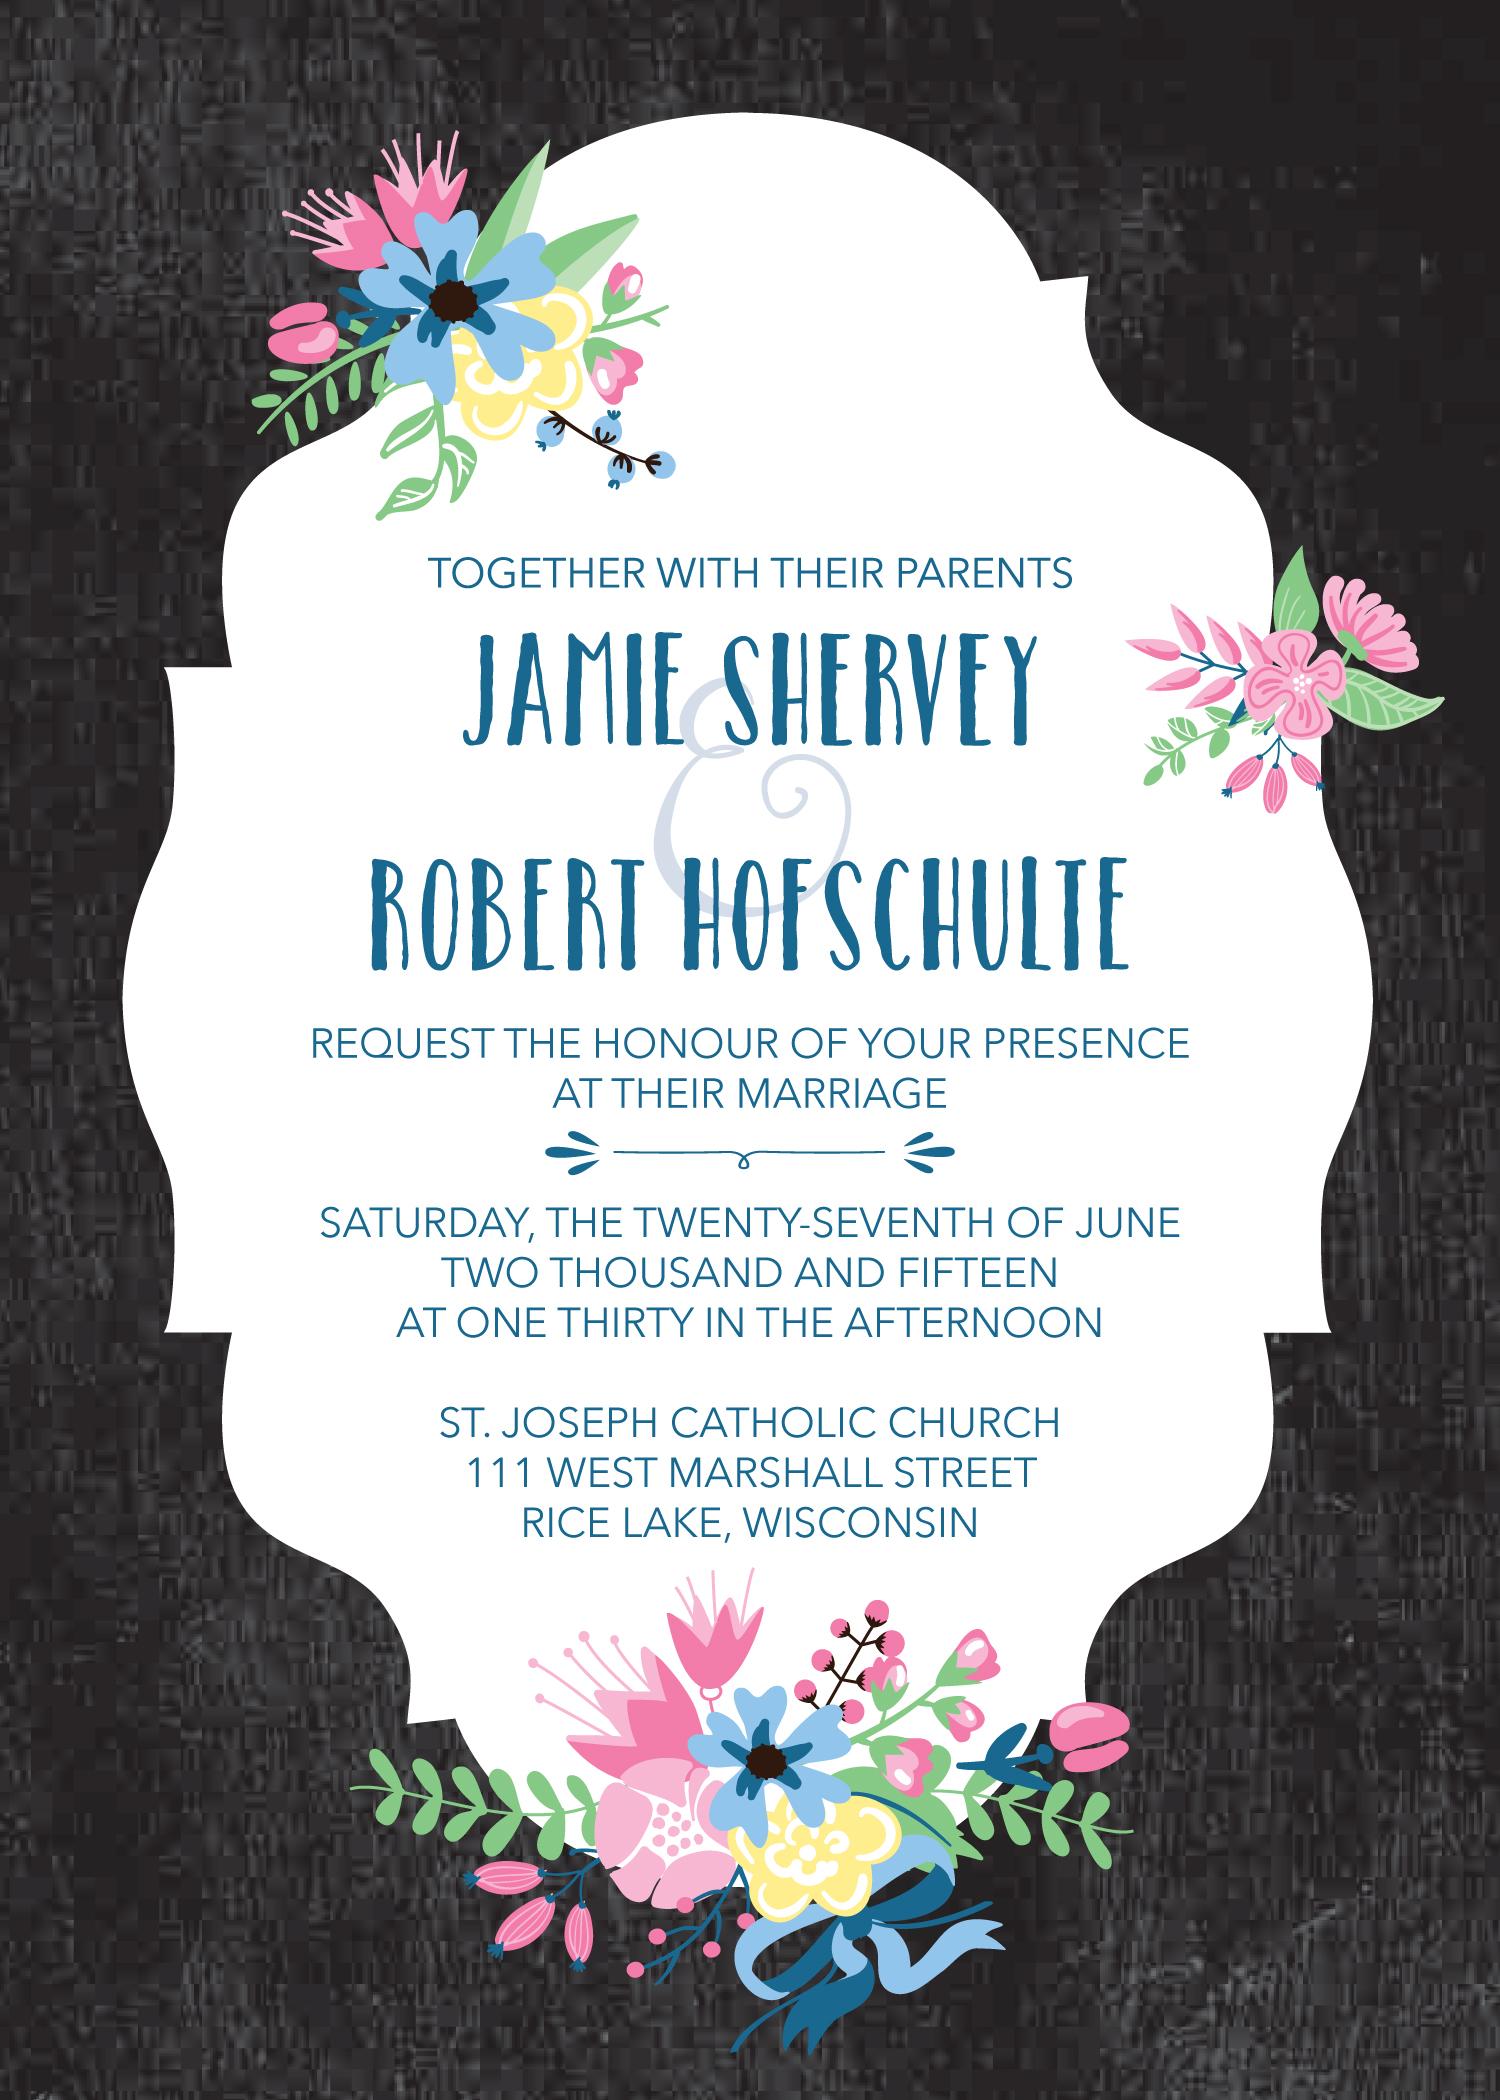 Shervey-Hofschulte Invite.jpg